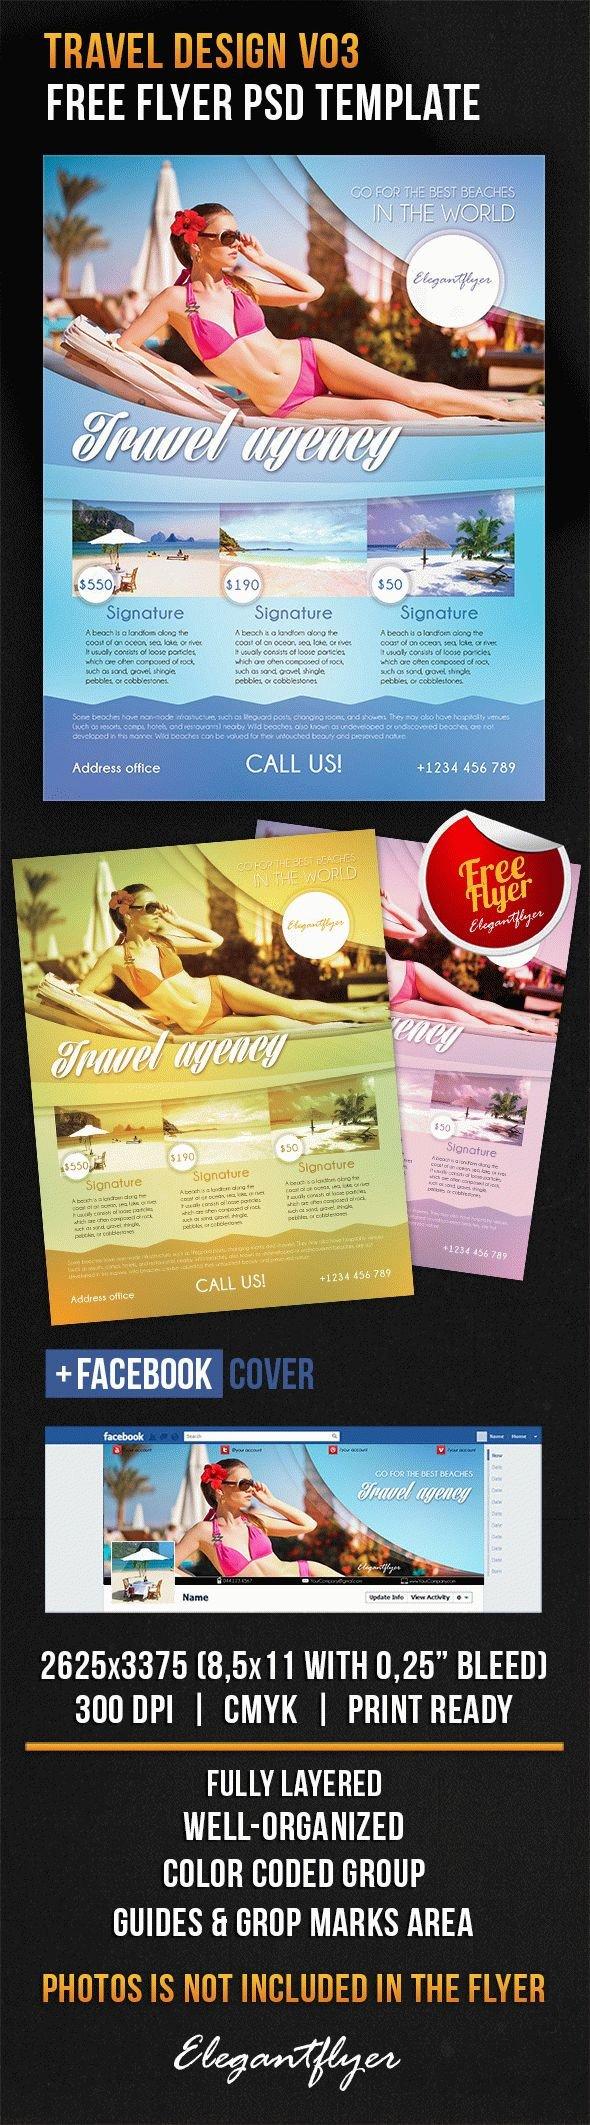 Travel Flyer Template Free Travel Design V03 – Free Flyer Psd Template – by Elegantflyer